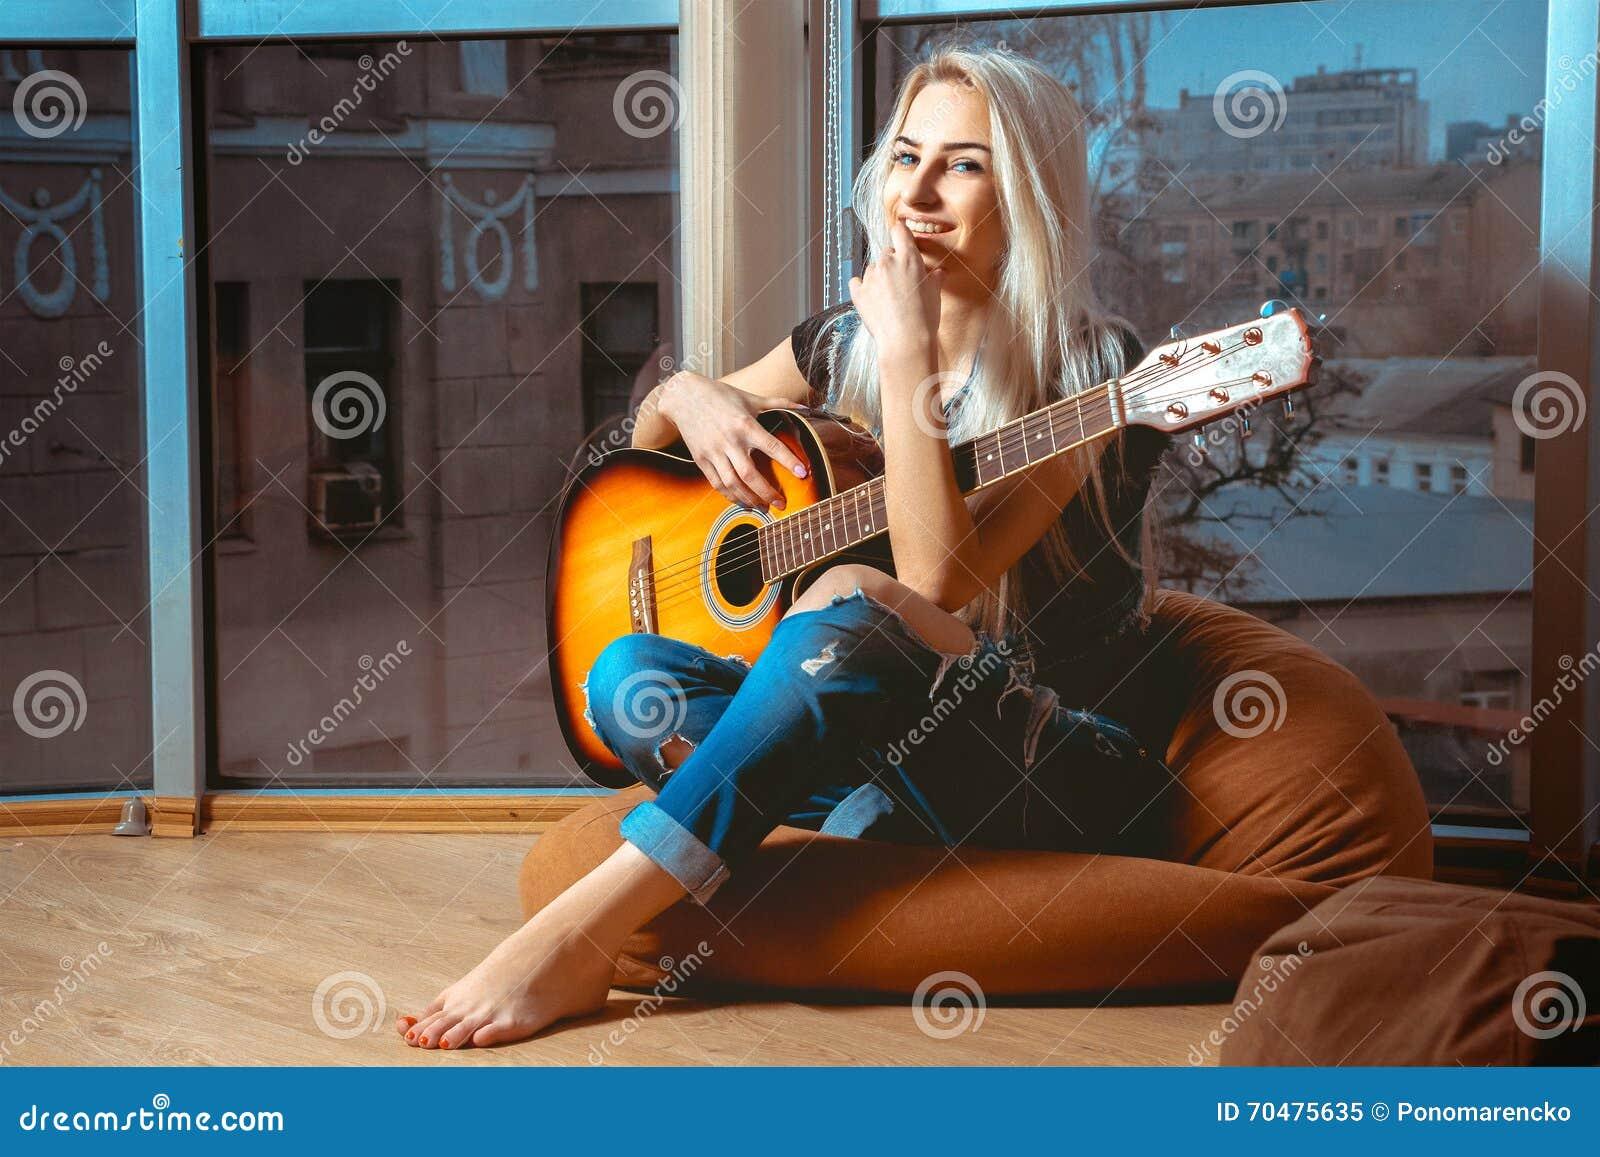 joyful young blonde girl plays guitar stock image image of blonde